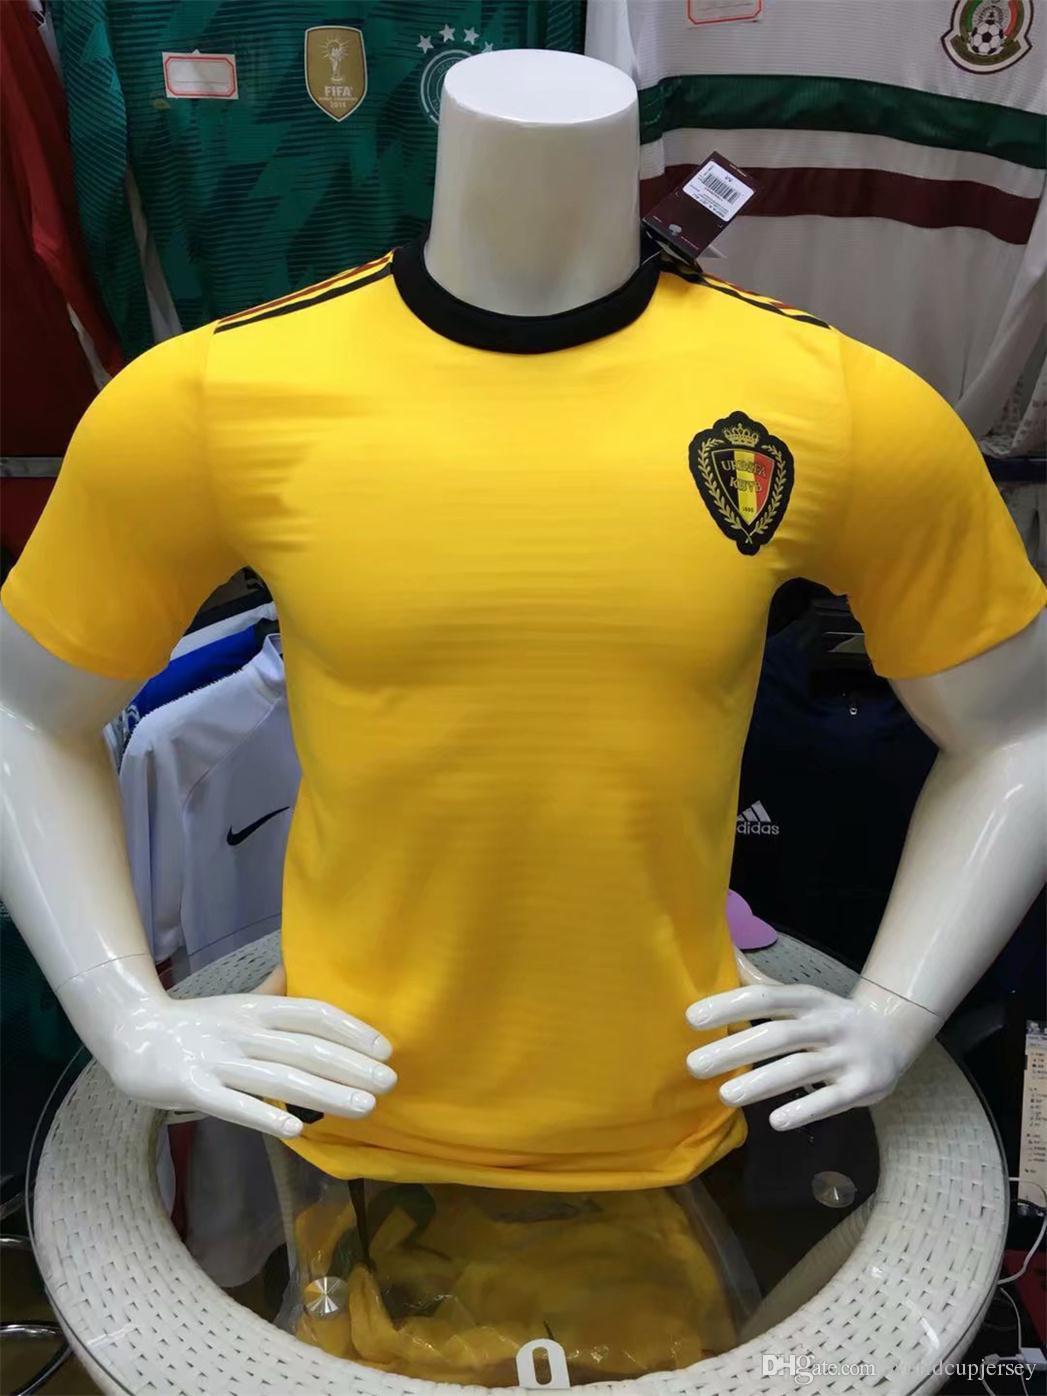 b8c5ec56d57 2019 Thail Quality 2018 World Cup Belgium Soccer Jersey Player Version LUKAKU  FELLAINI E.HAZARD KOMPANY DE BRUYNE 18 19 Belgium Football Shirt From ...